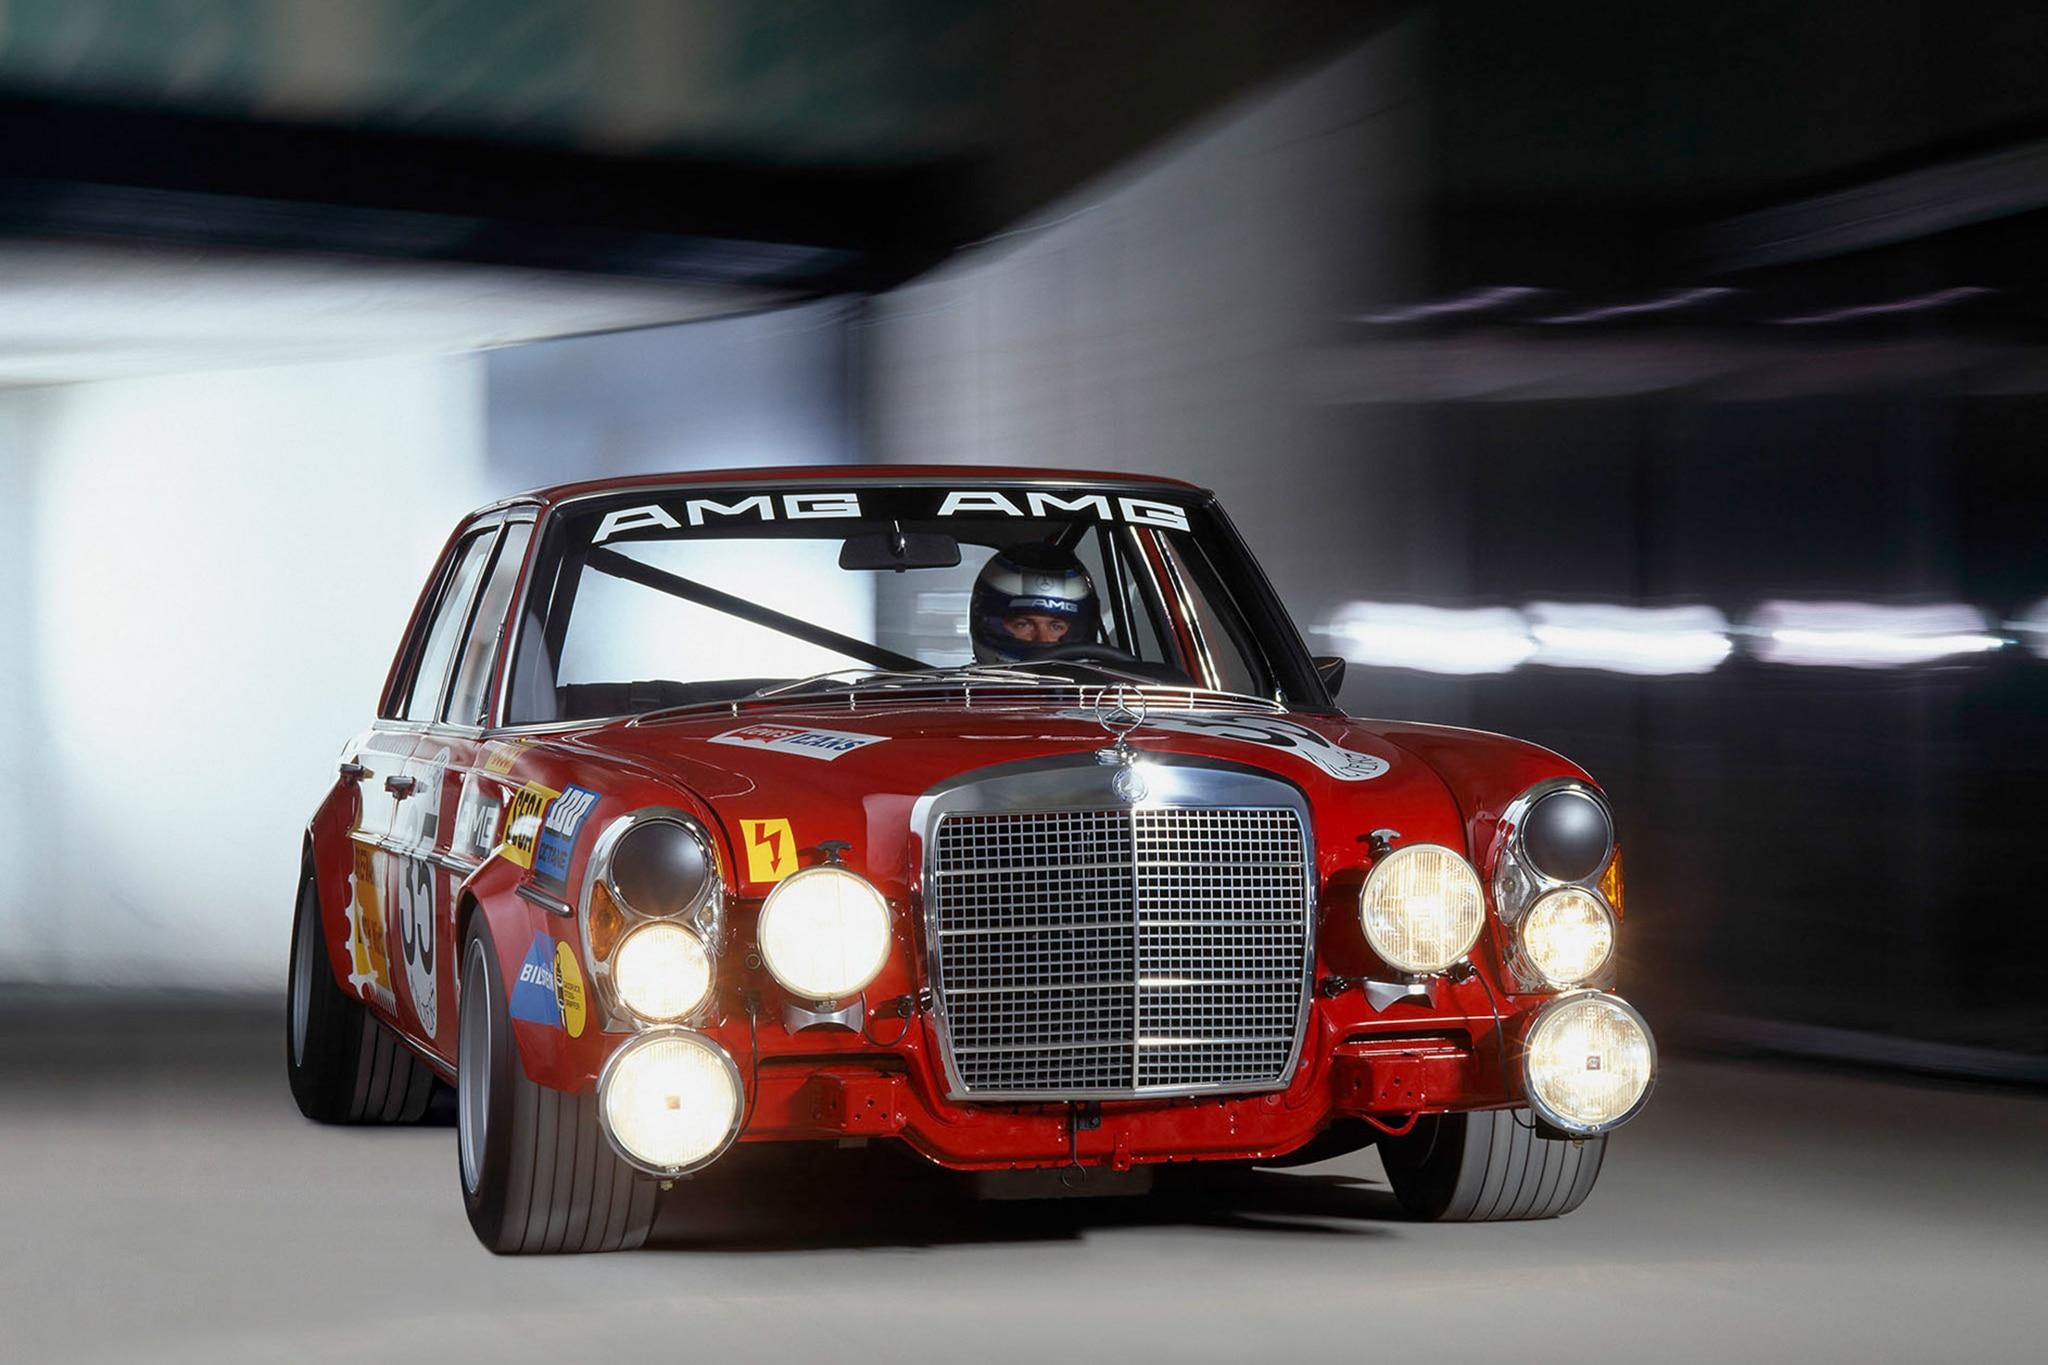 1971 Mercedes AMG 300SEL 6